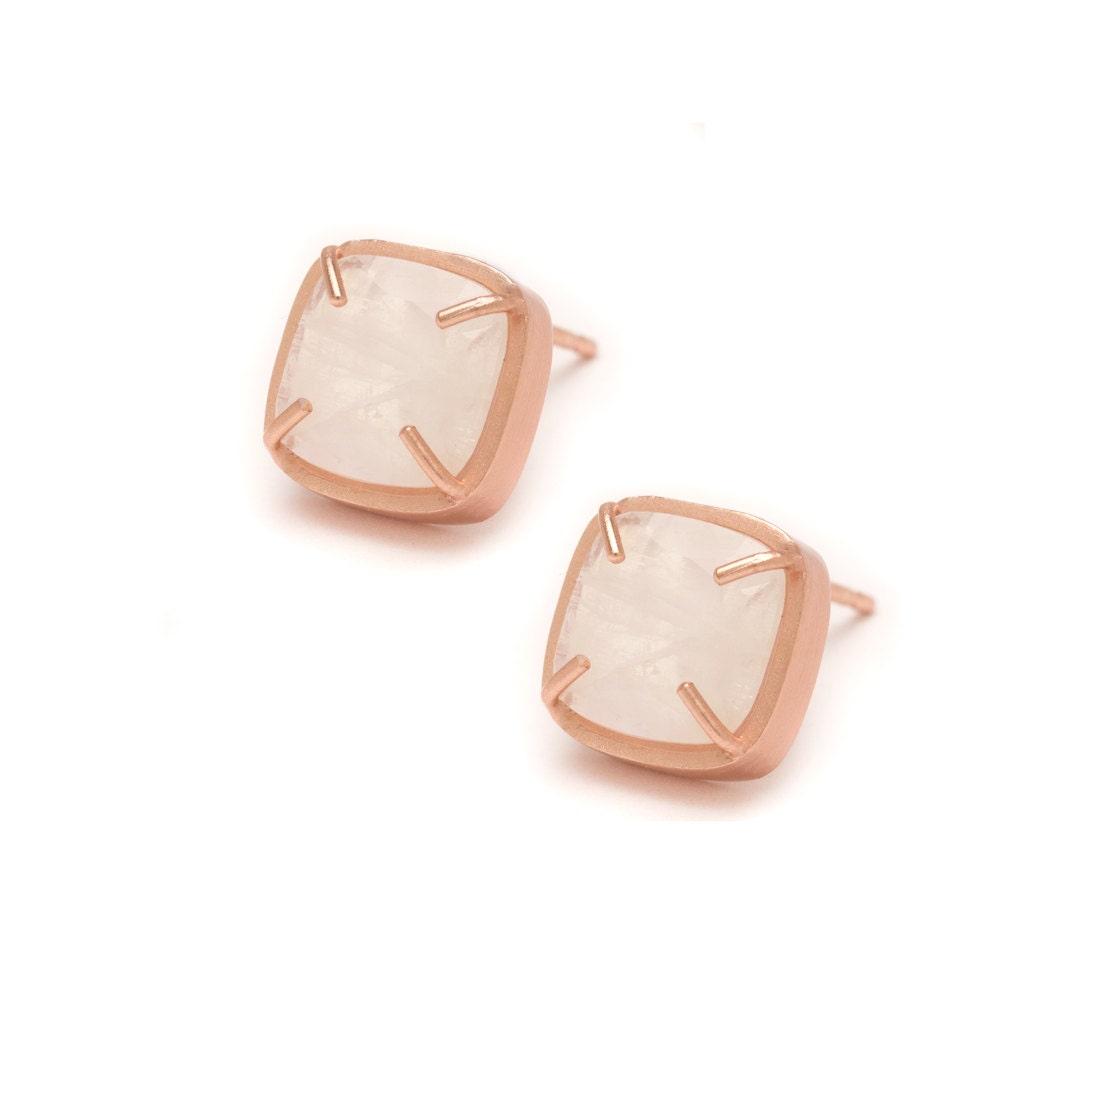 moonstone stud earrings rose gold gemstone stud earrings. Black Bedroom Furniture Sets. Home Design Ideas